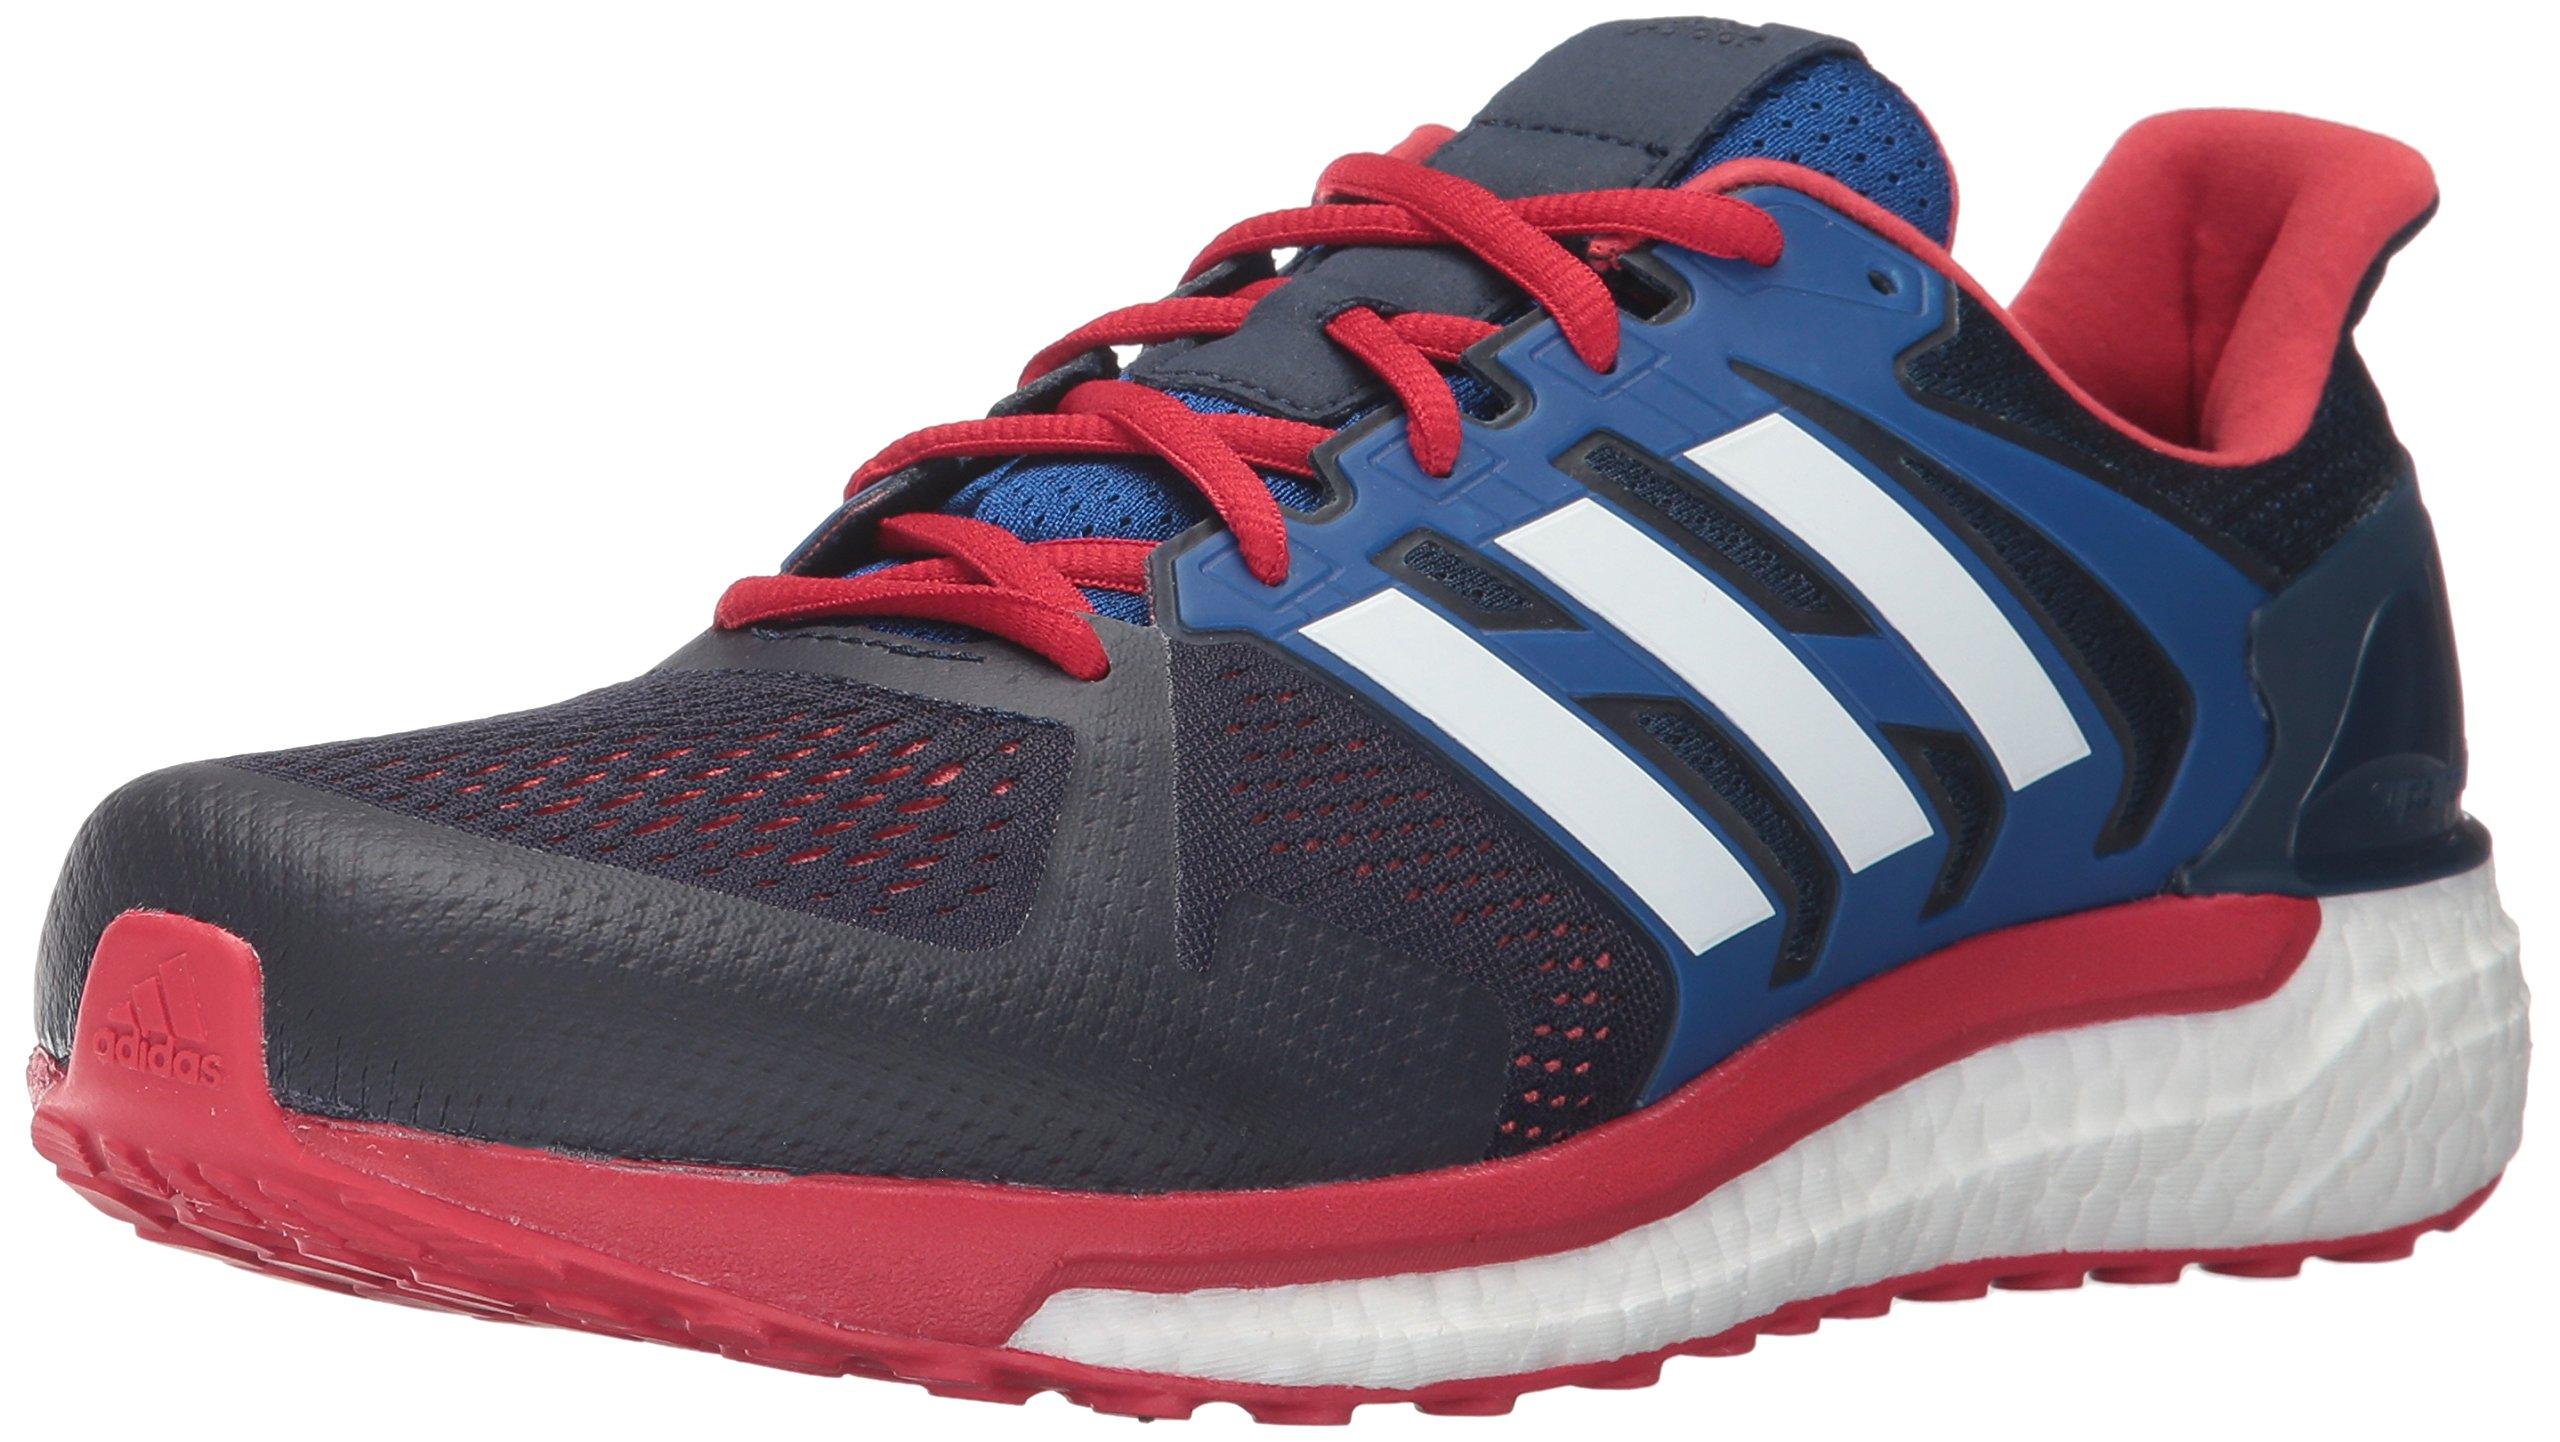 best service 7a471 208ac Galleon - Adidas Men s Supernova St M Running Shoe, Collegiate Navy White Scarlet,  7.5 Medium US